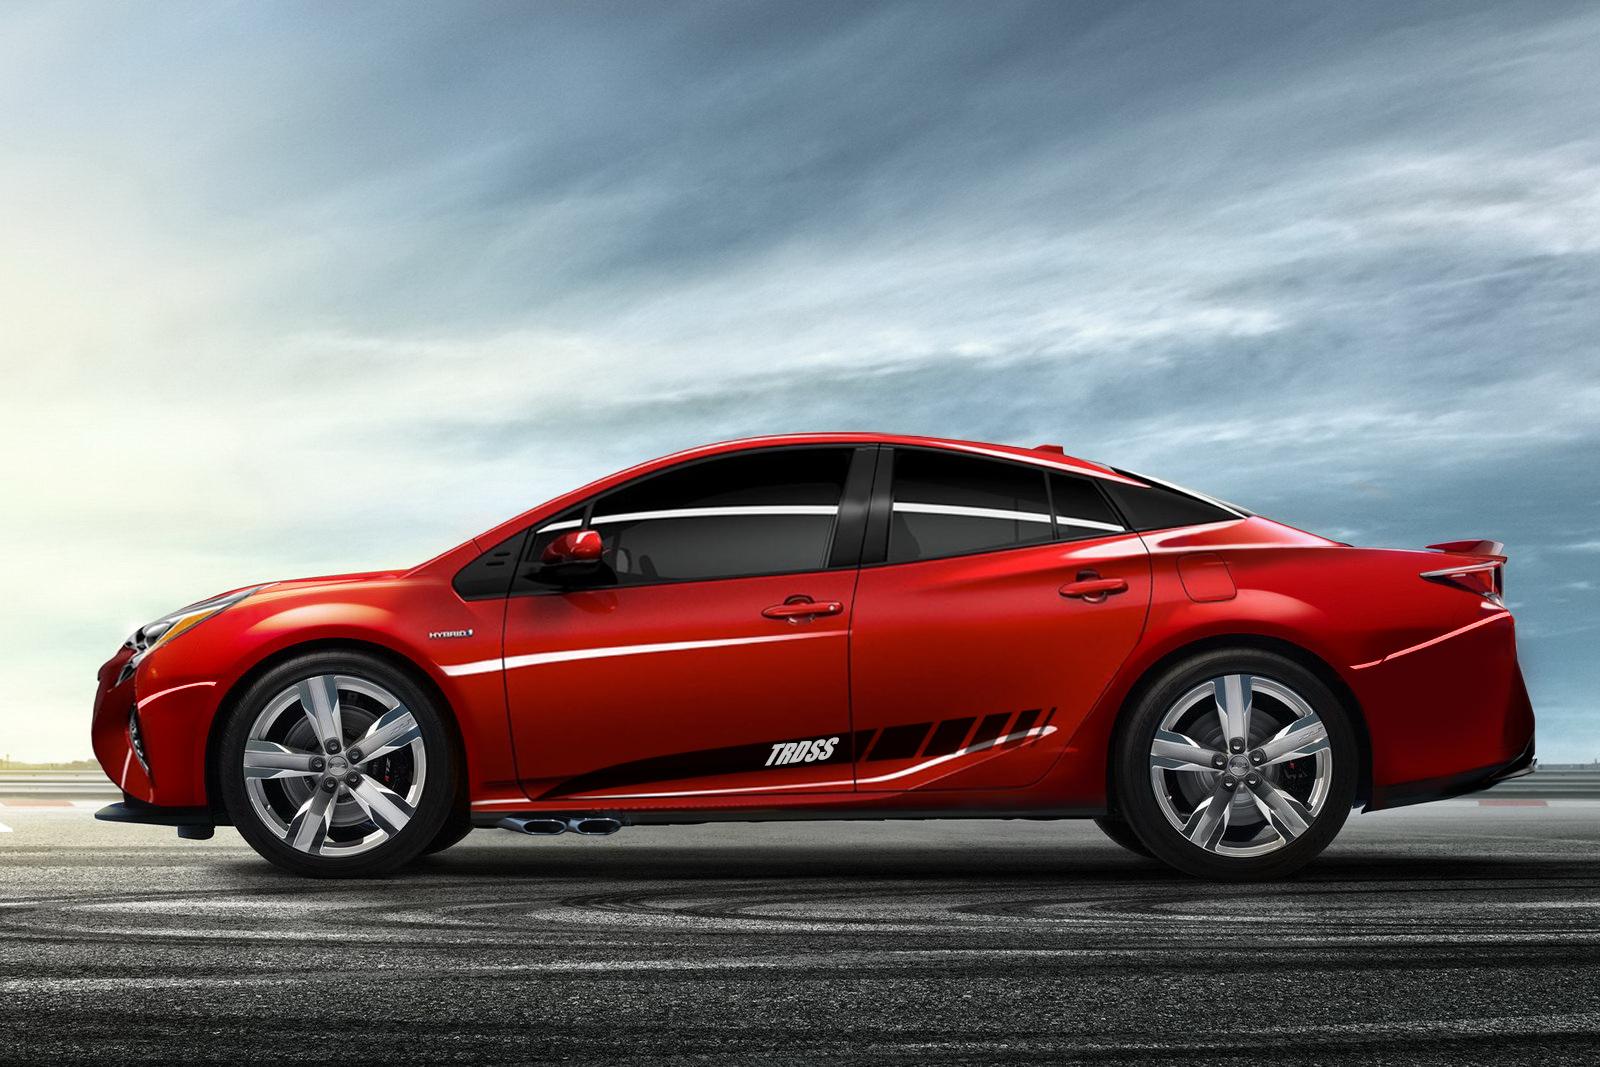 2017-Toyota-Prius-TRD-SS-Profile-Photo